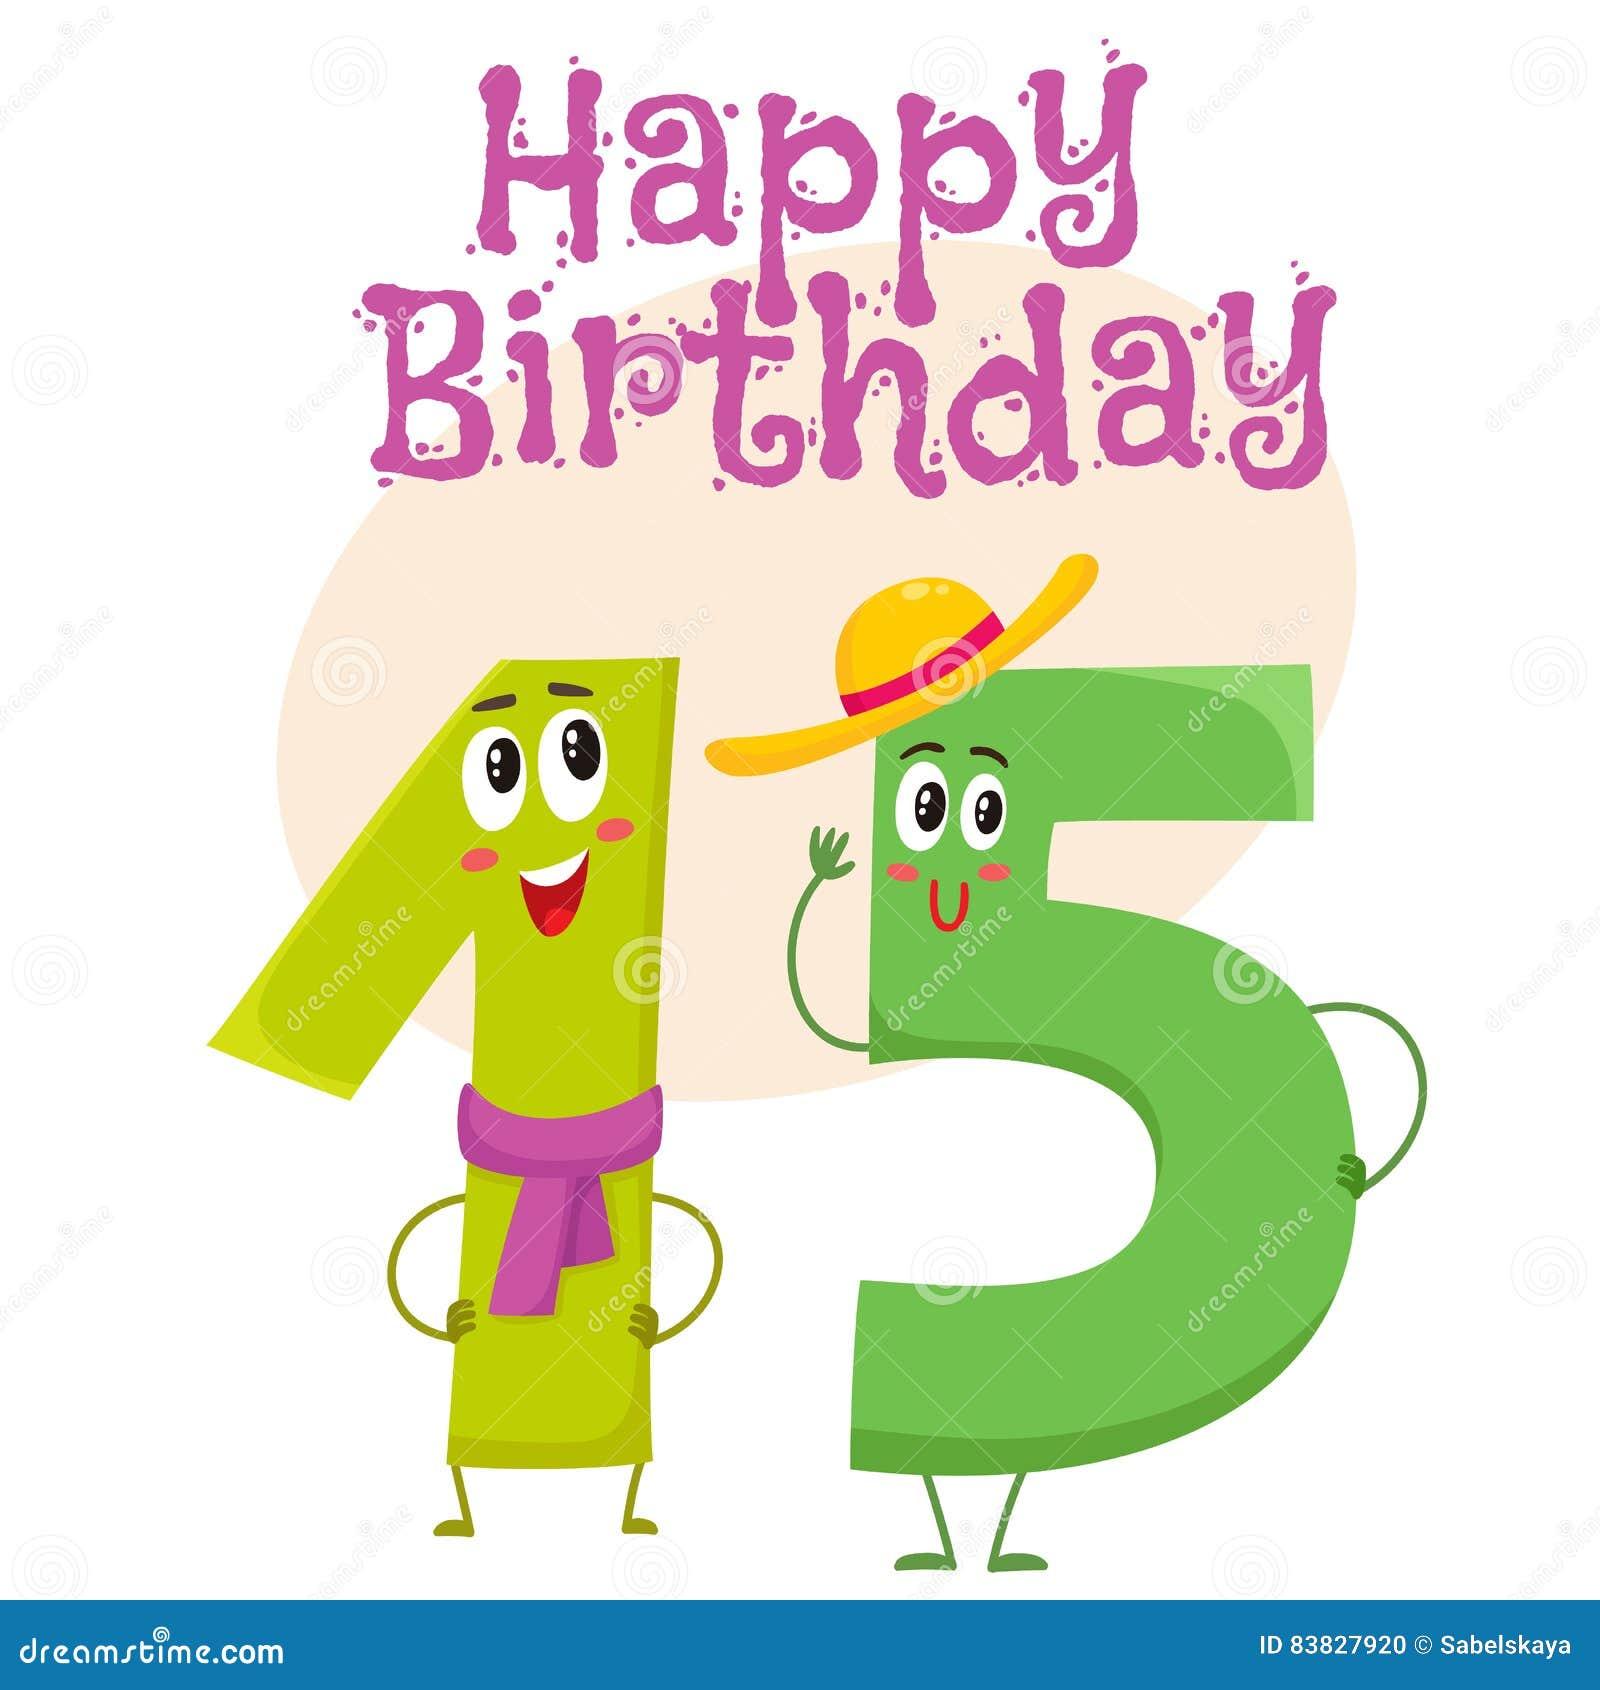 Happy birthday vector greeting card design with fifteen number happy birthday vector greeting card design with fifteen number characters kristyandbryce Choice Image